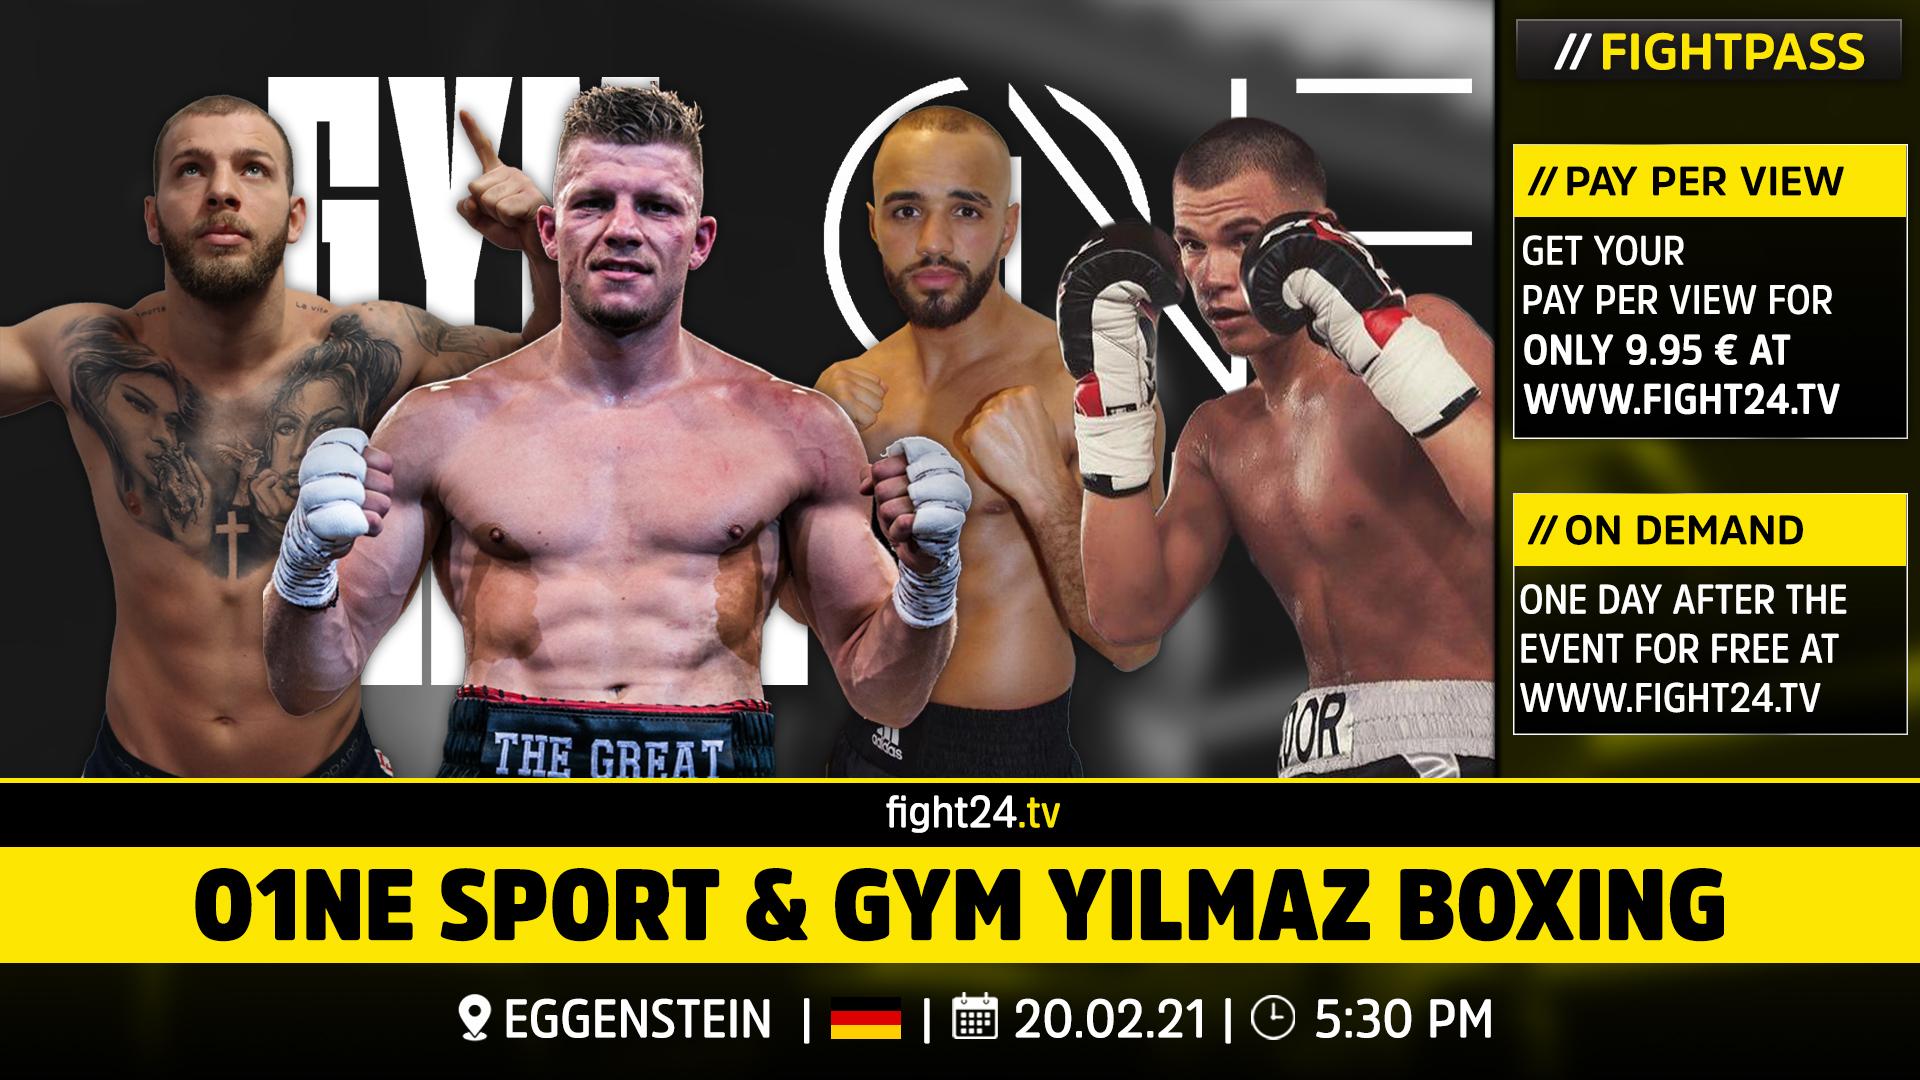 O1NE Sport & Gym Yilmaz Boxing